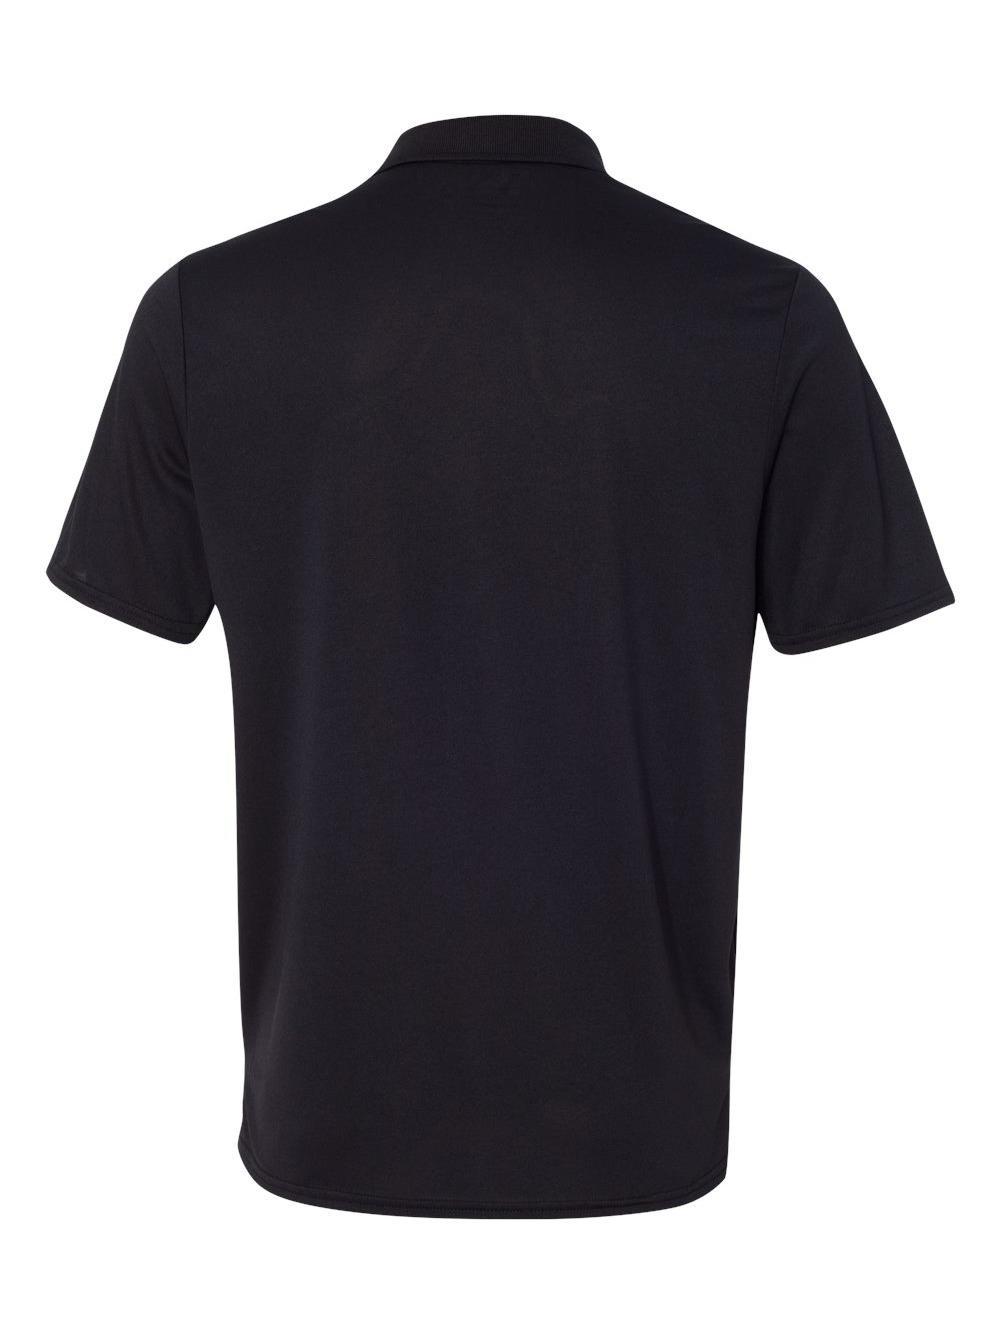 Gildan-Performance-Jersey-Sport-Shirt-44800 thumbnail 4